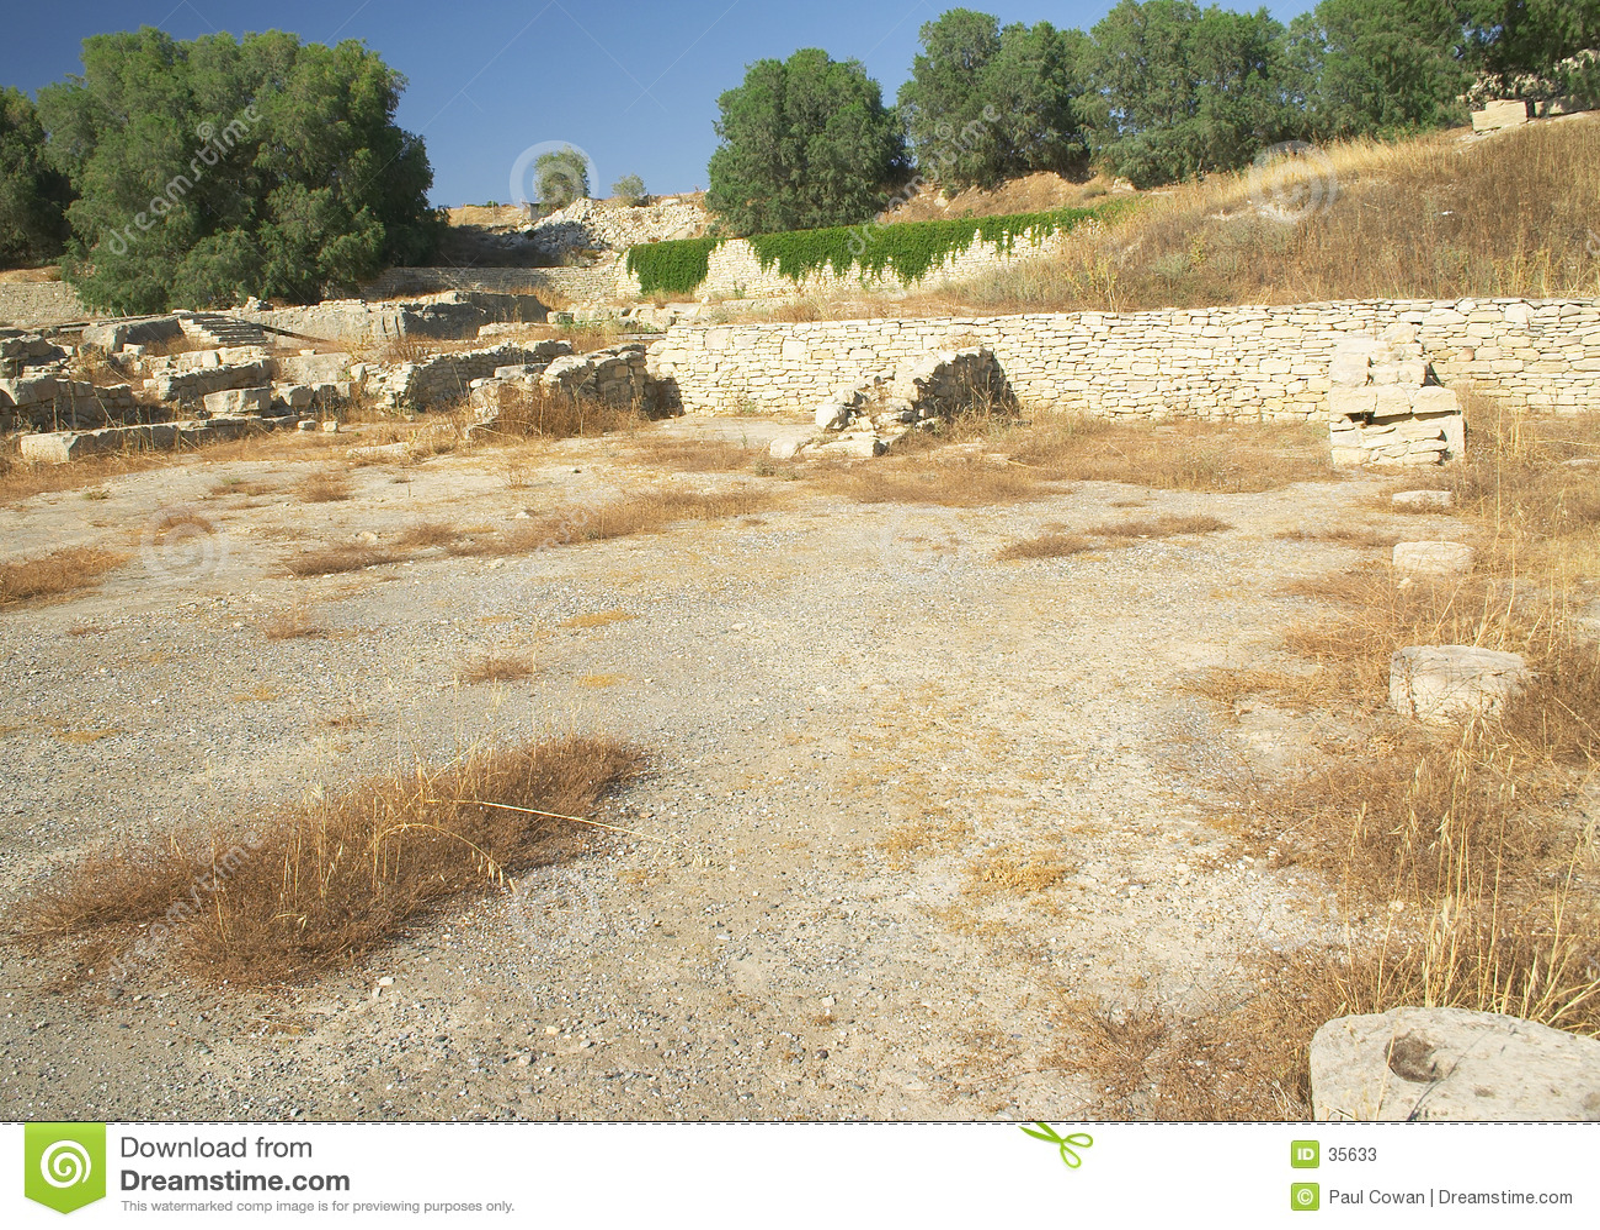 Minoan/Roman harbour, Kommos